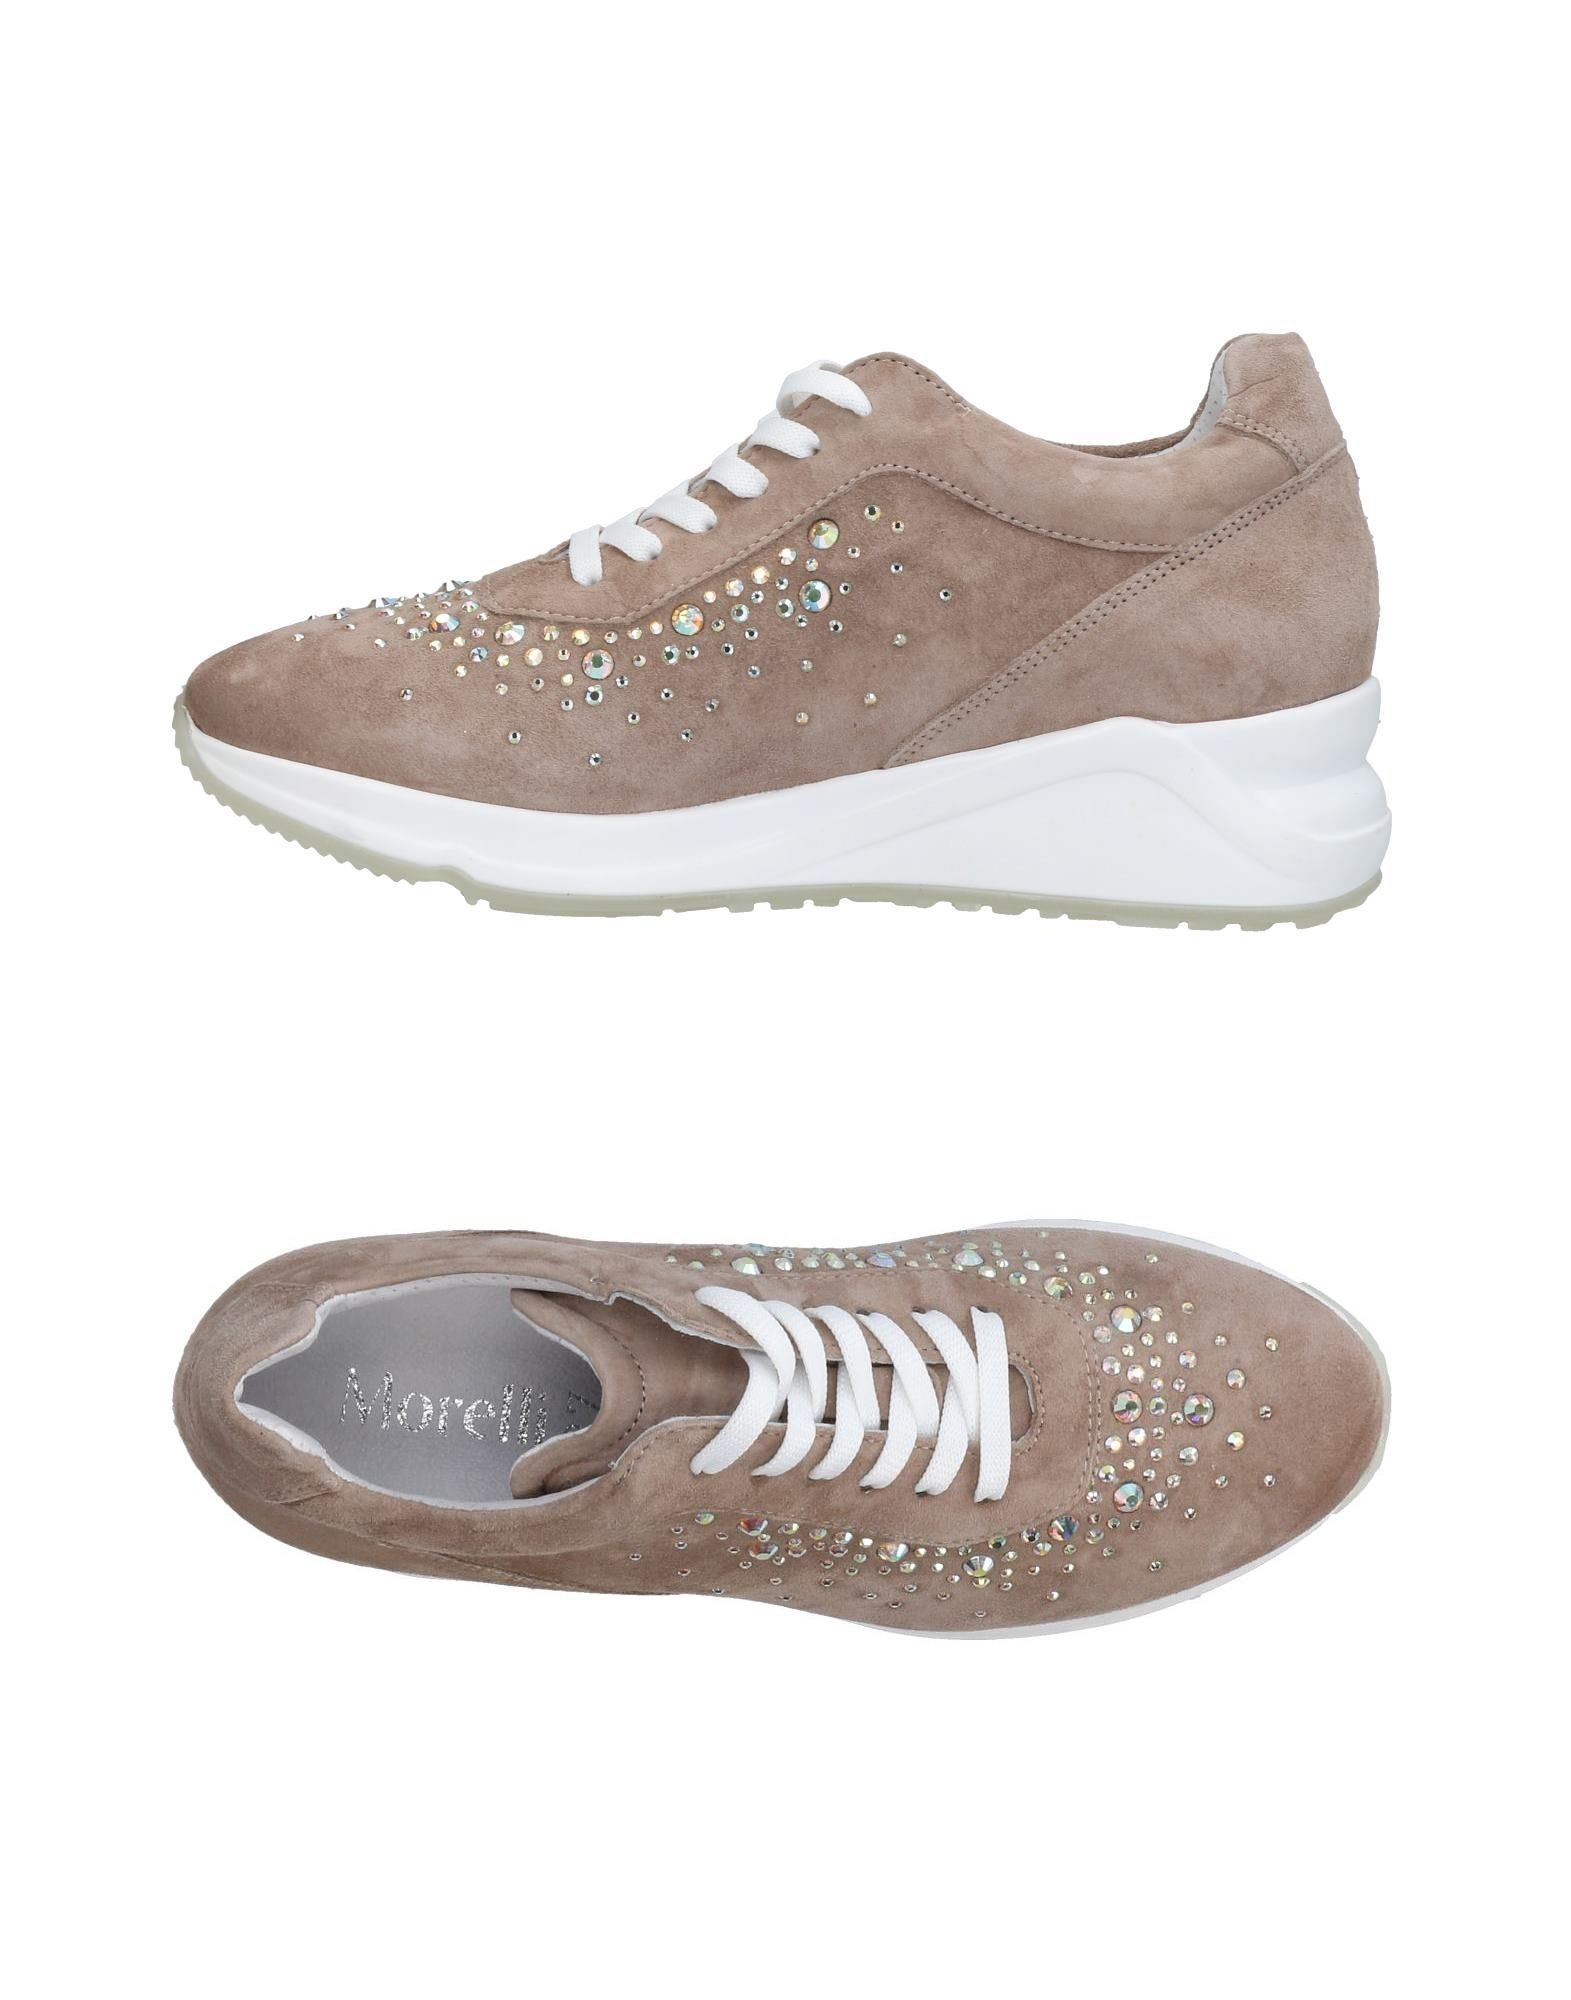 Andrea Morelli Sneakers Damen  11456894RC Gute Qualität beliebte Schuhe